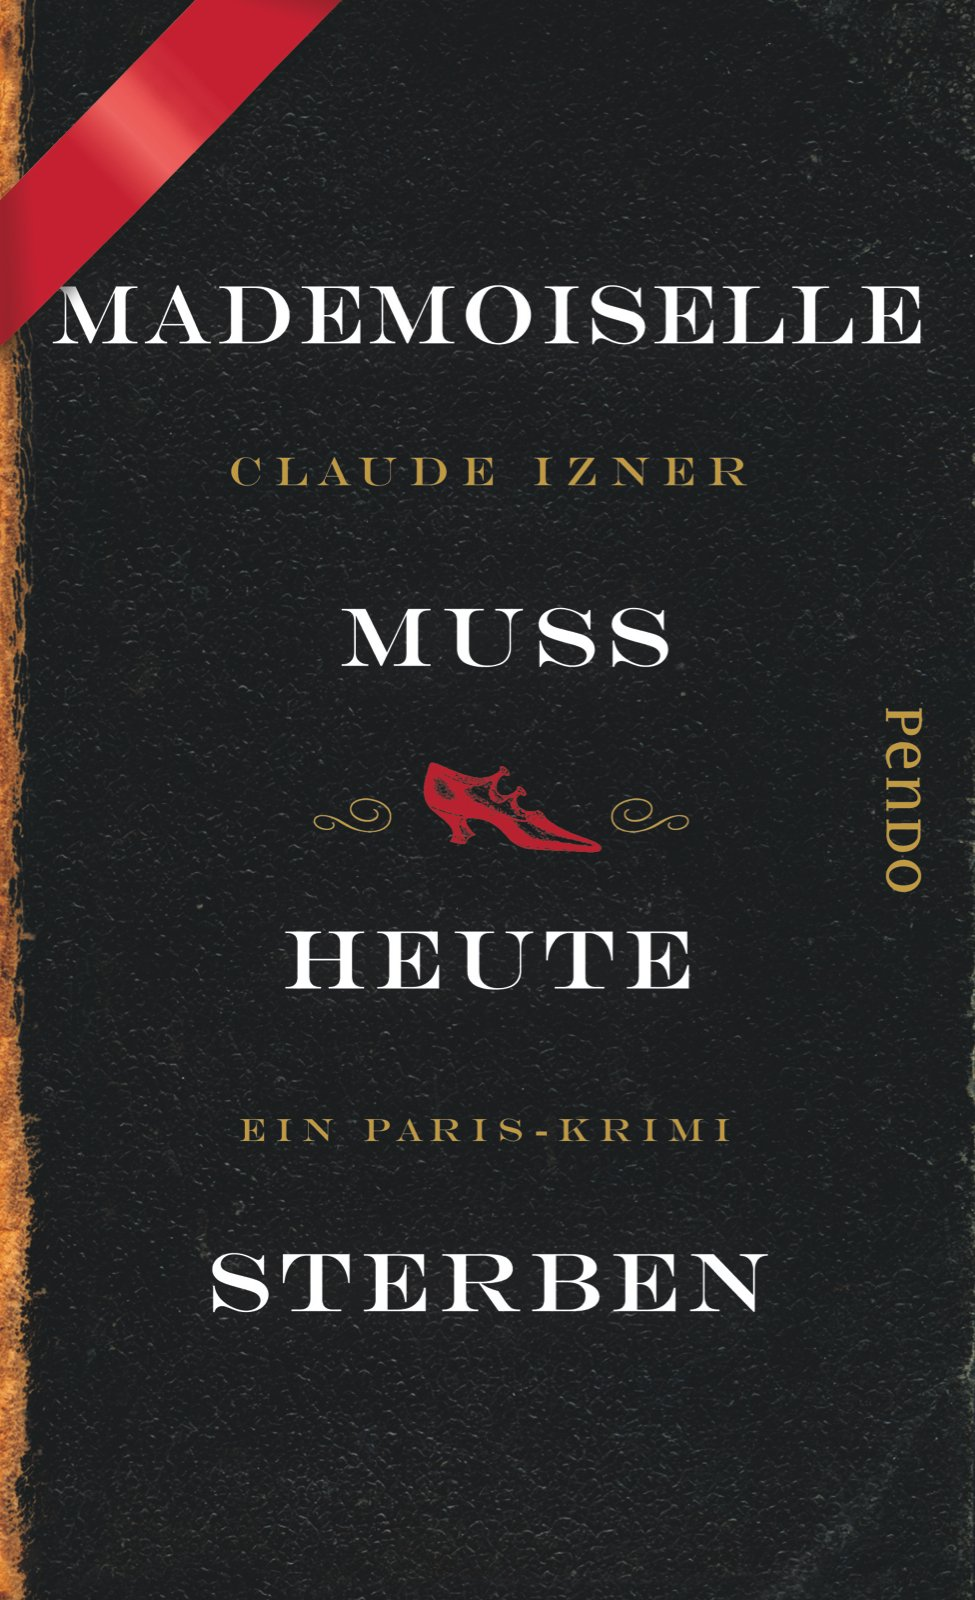 Mademoiselle muss heute sterben: Ein Paris-Krimi (Paris-Krimis, Band 3)